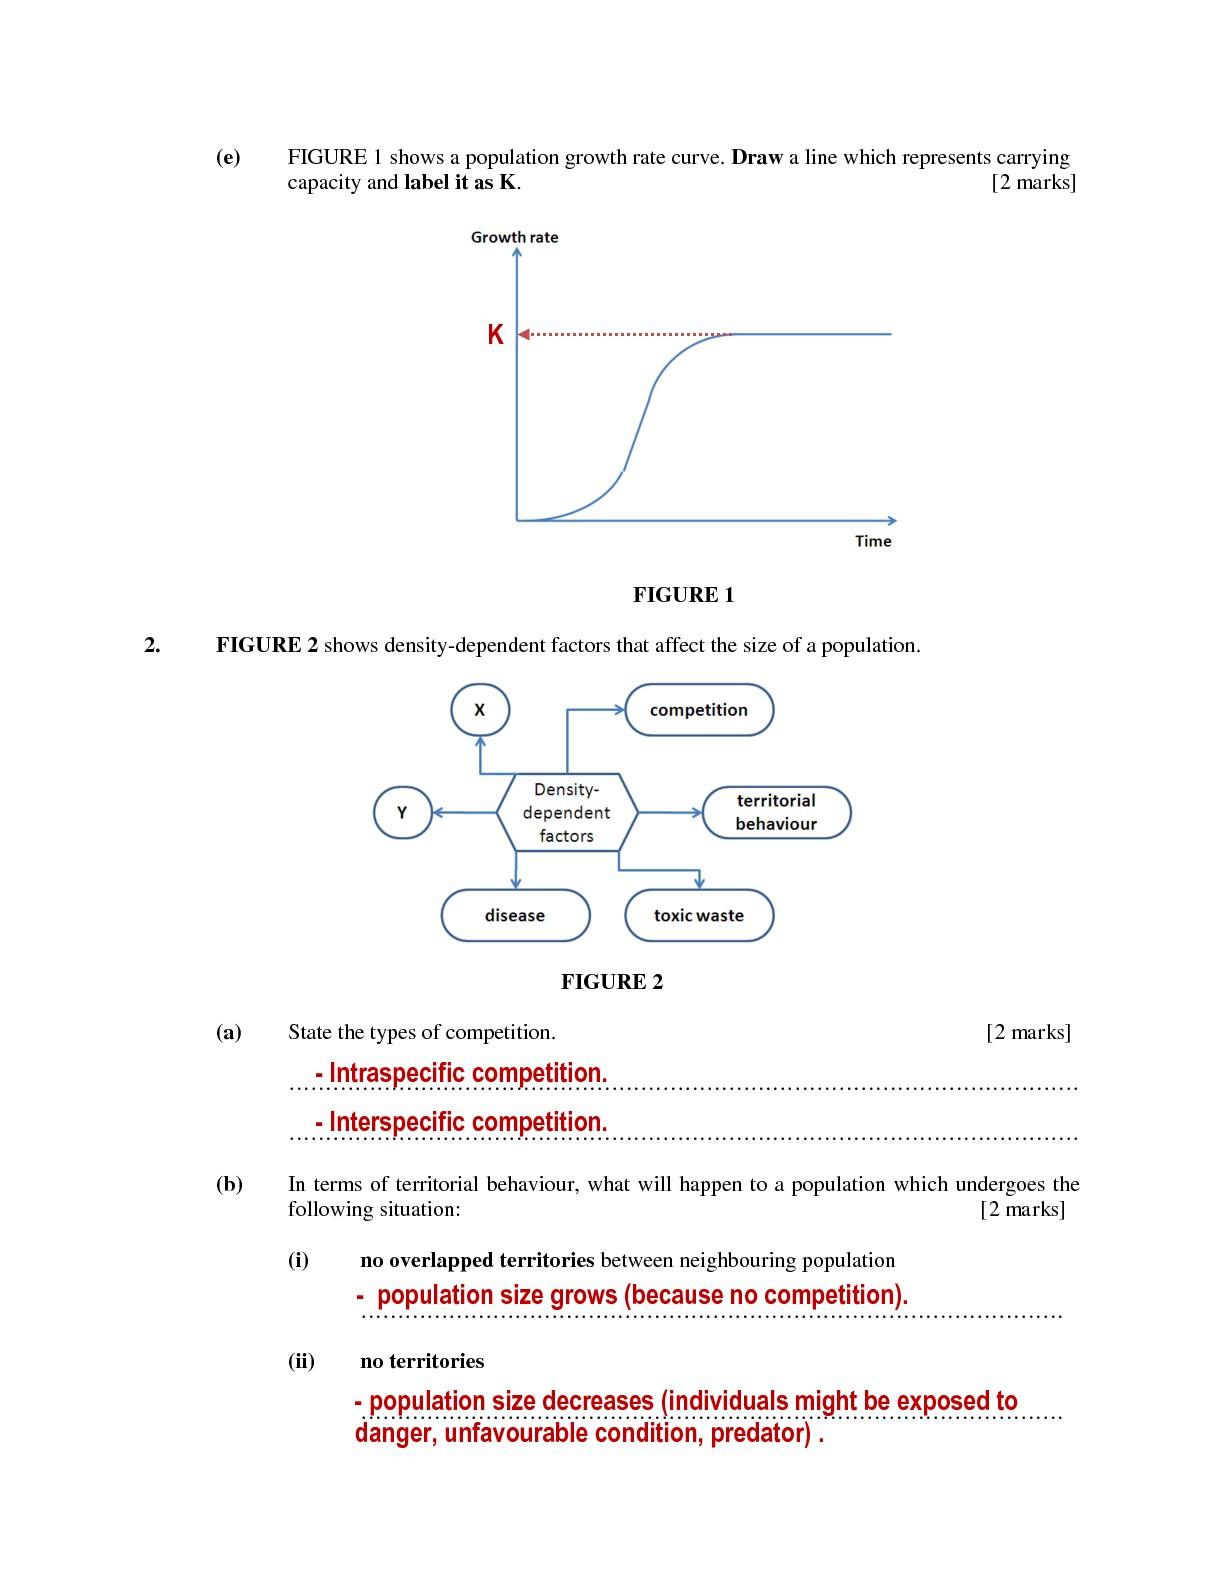 Anxiousbiologist Quiz 2 Population Ecology And Biocatalysis